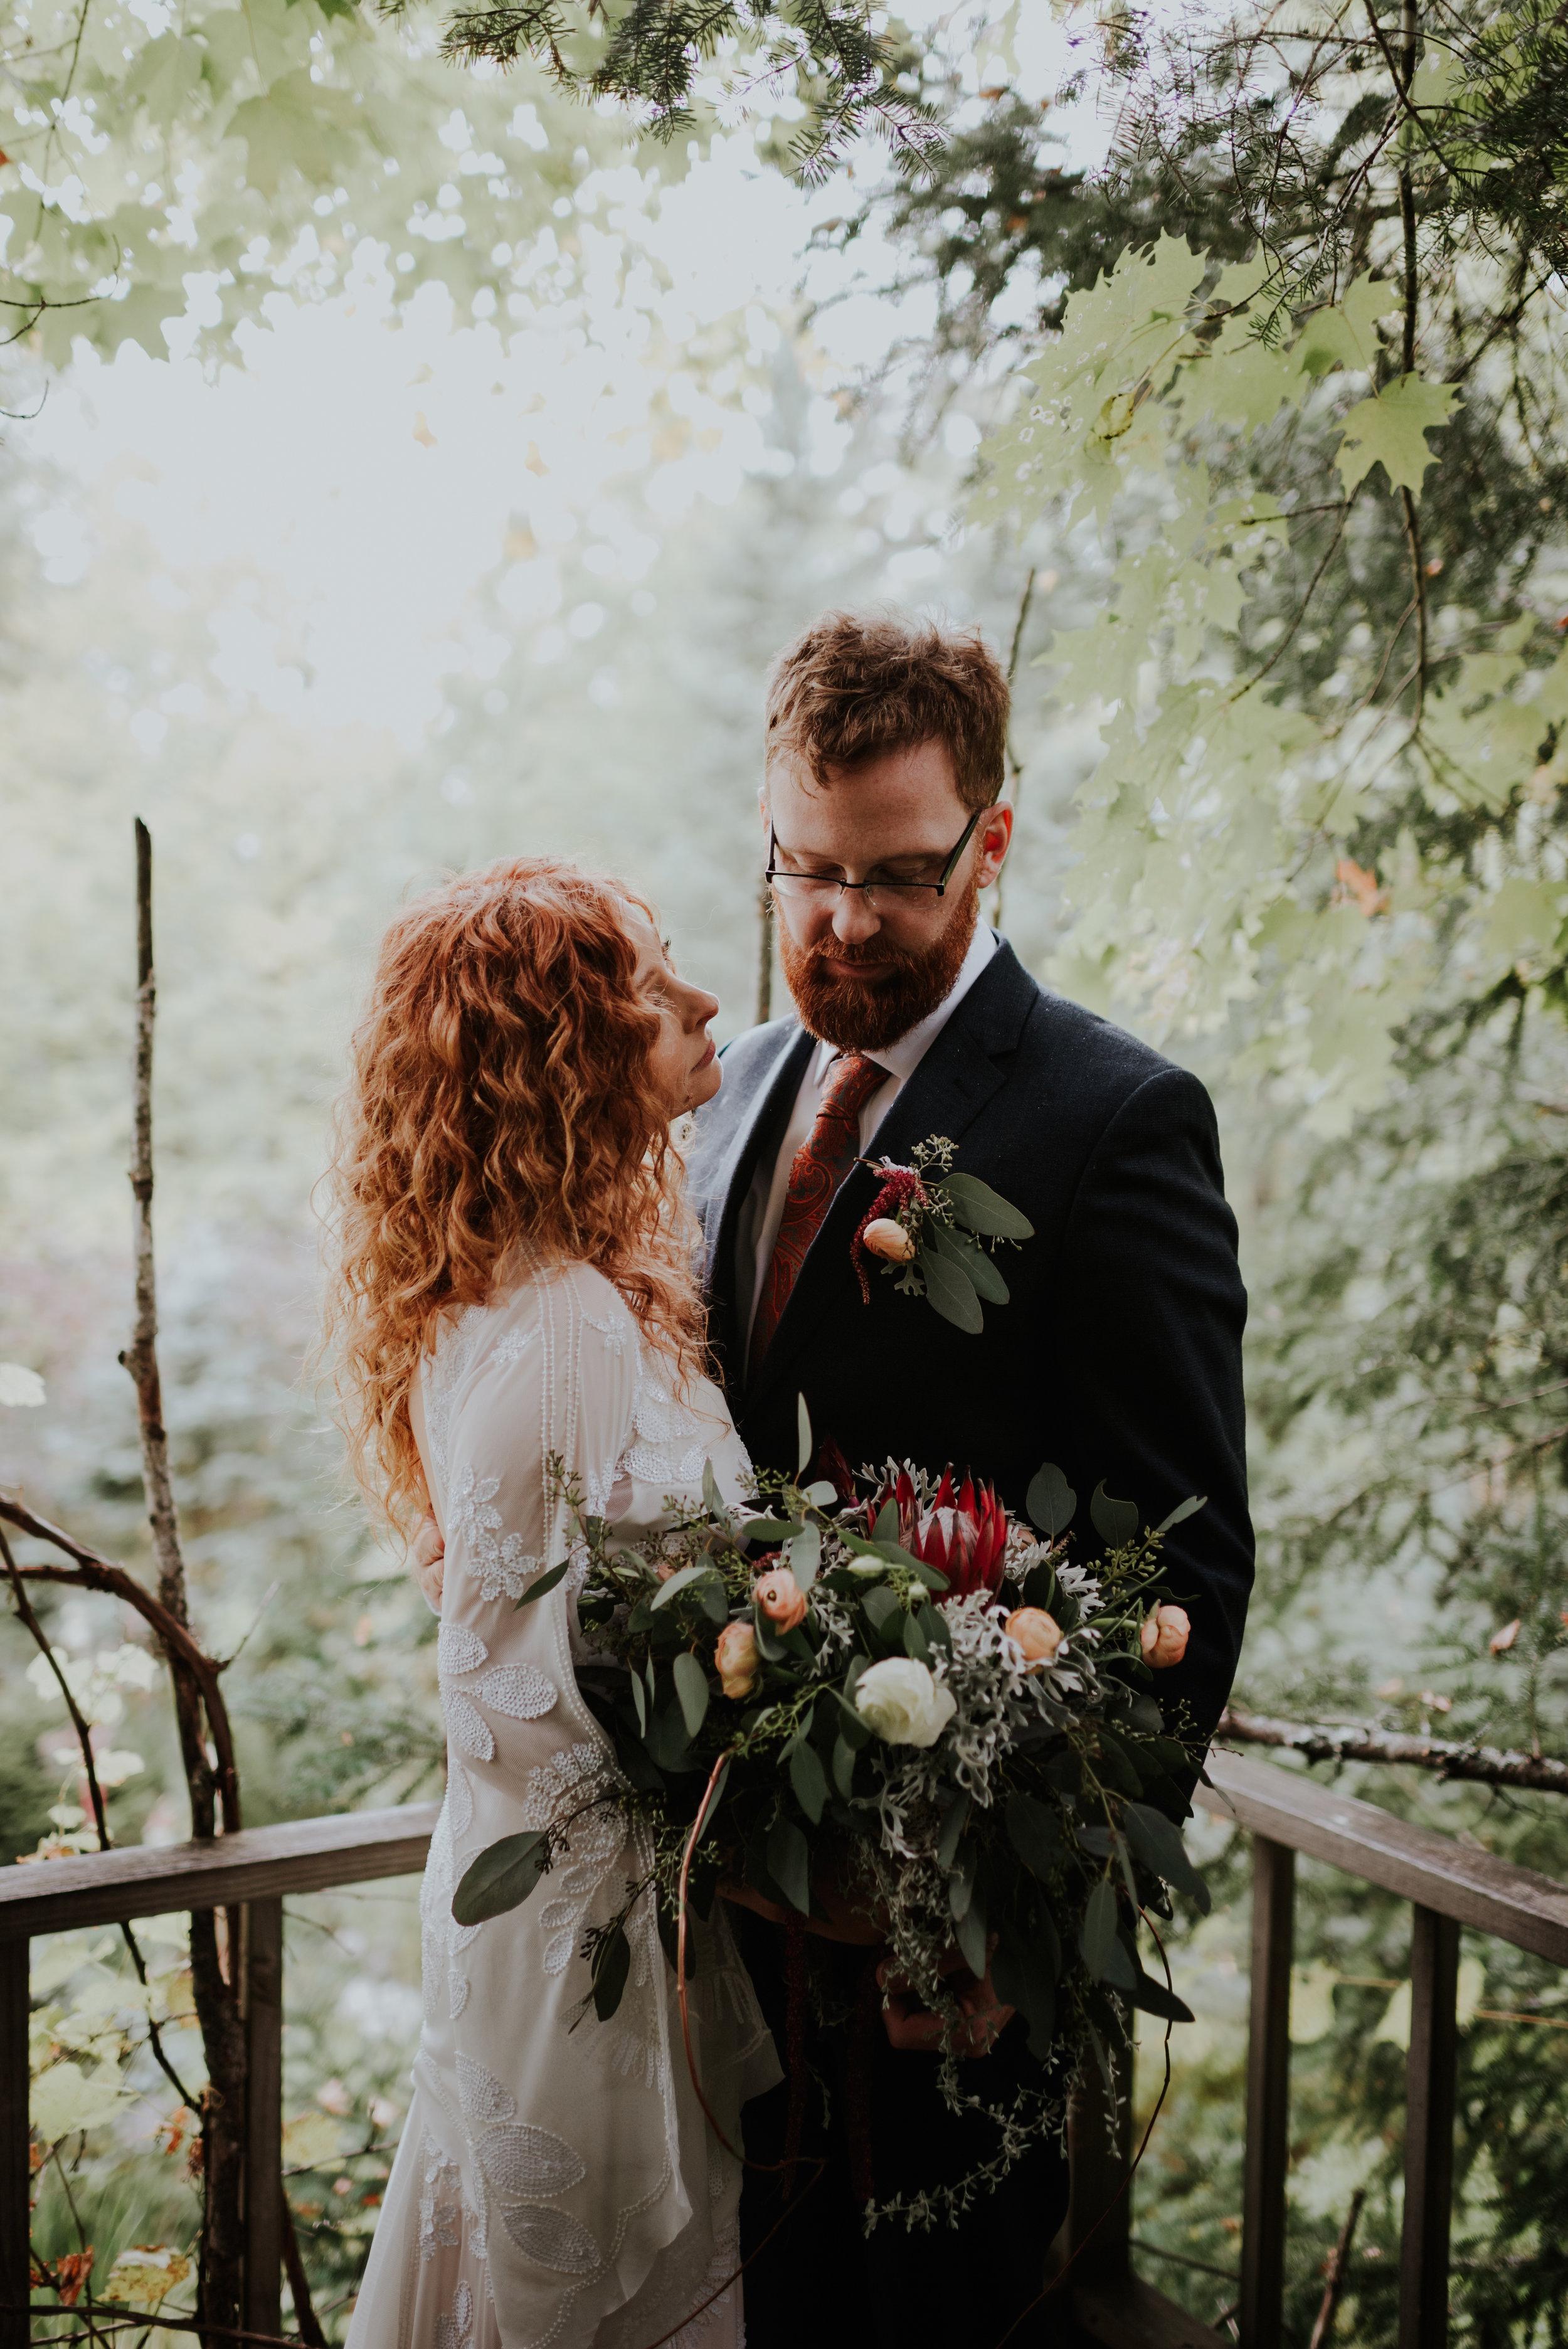 wildsoulsstudio-woodland-intimate-newengland-wedding-lake willoughby-p-103.jpg